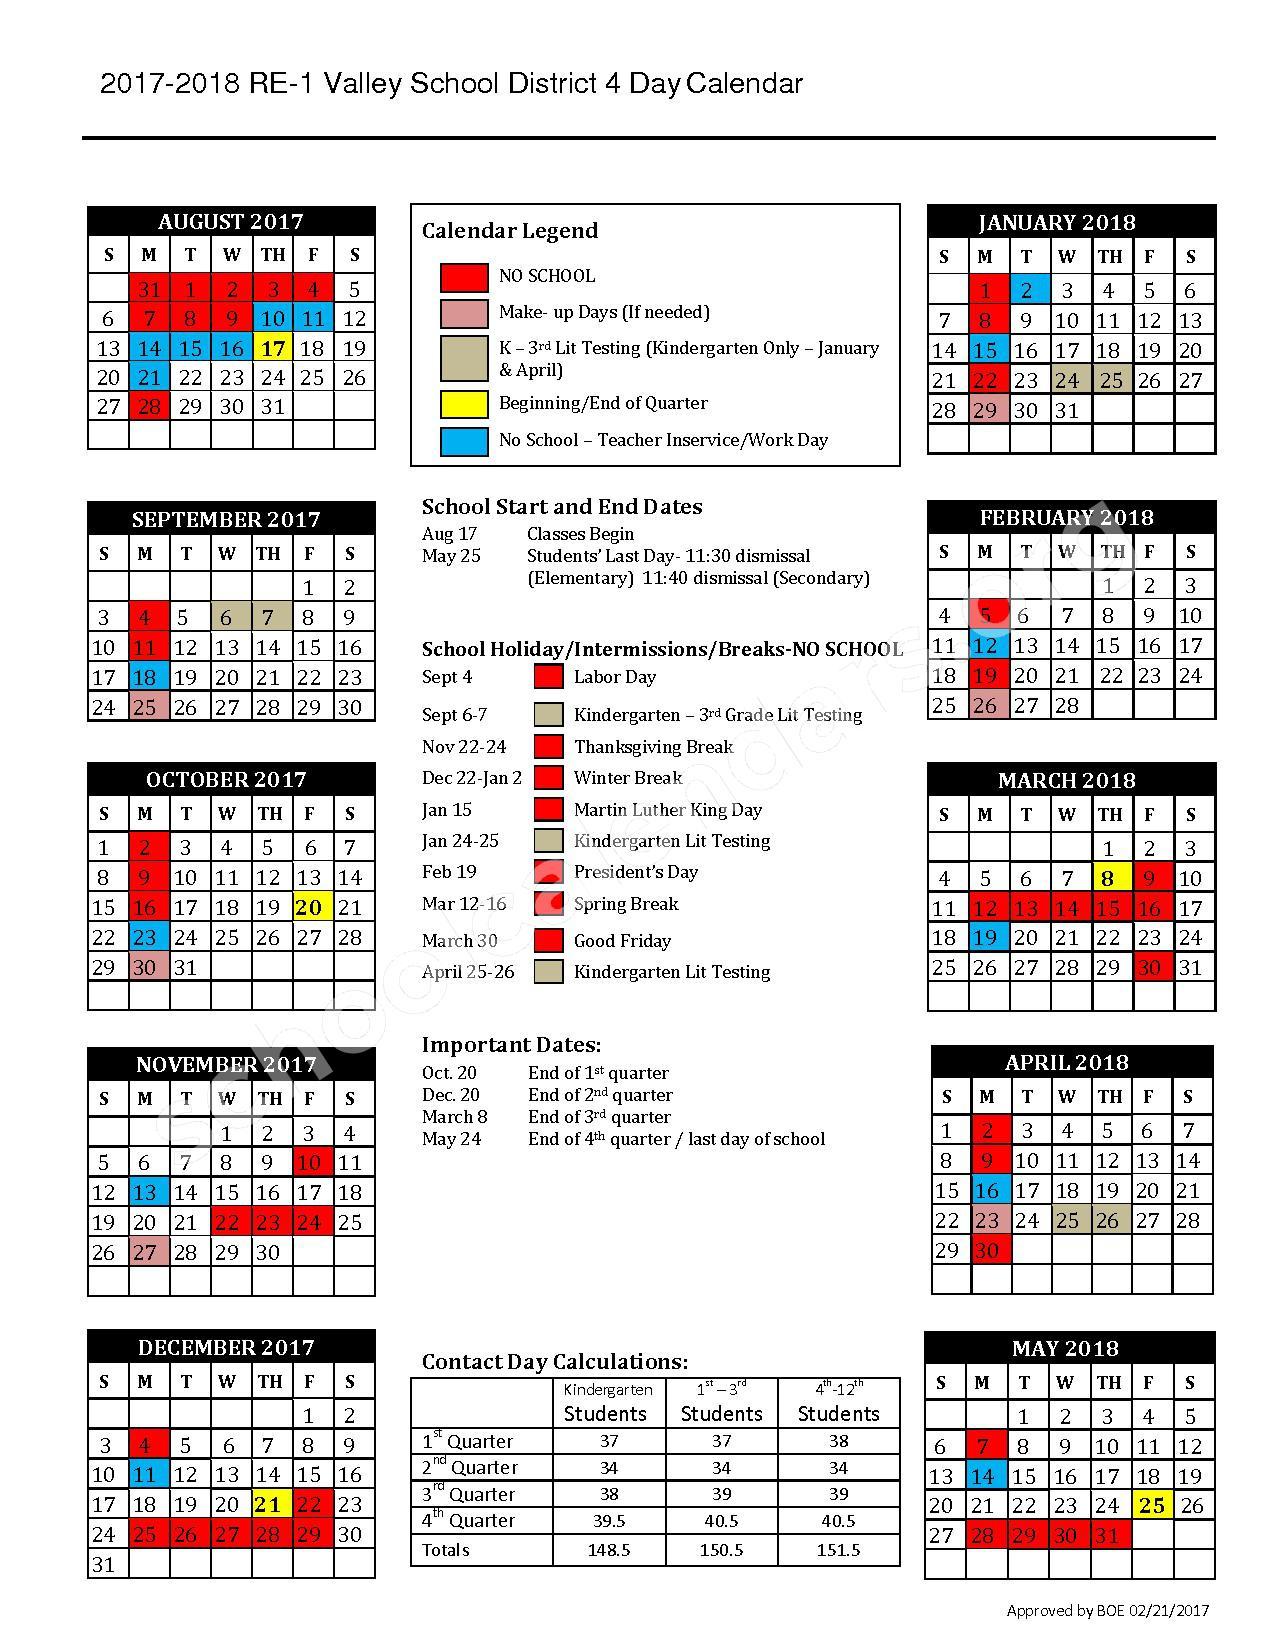 2017 - 2018 District Calendar – Valley School District RE-1 – page 1